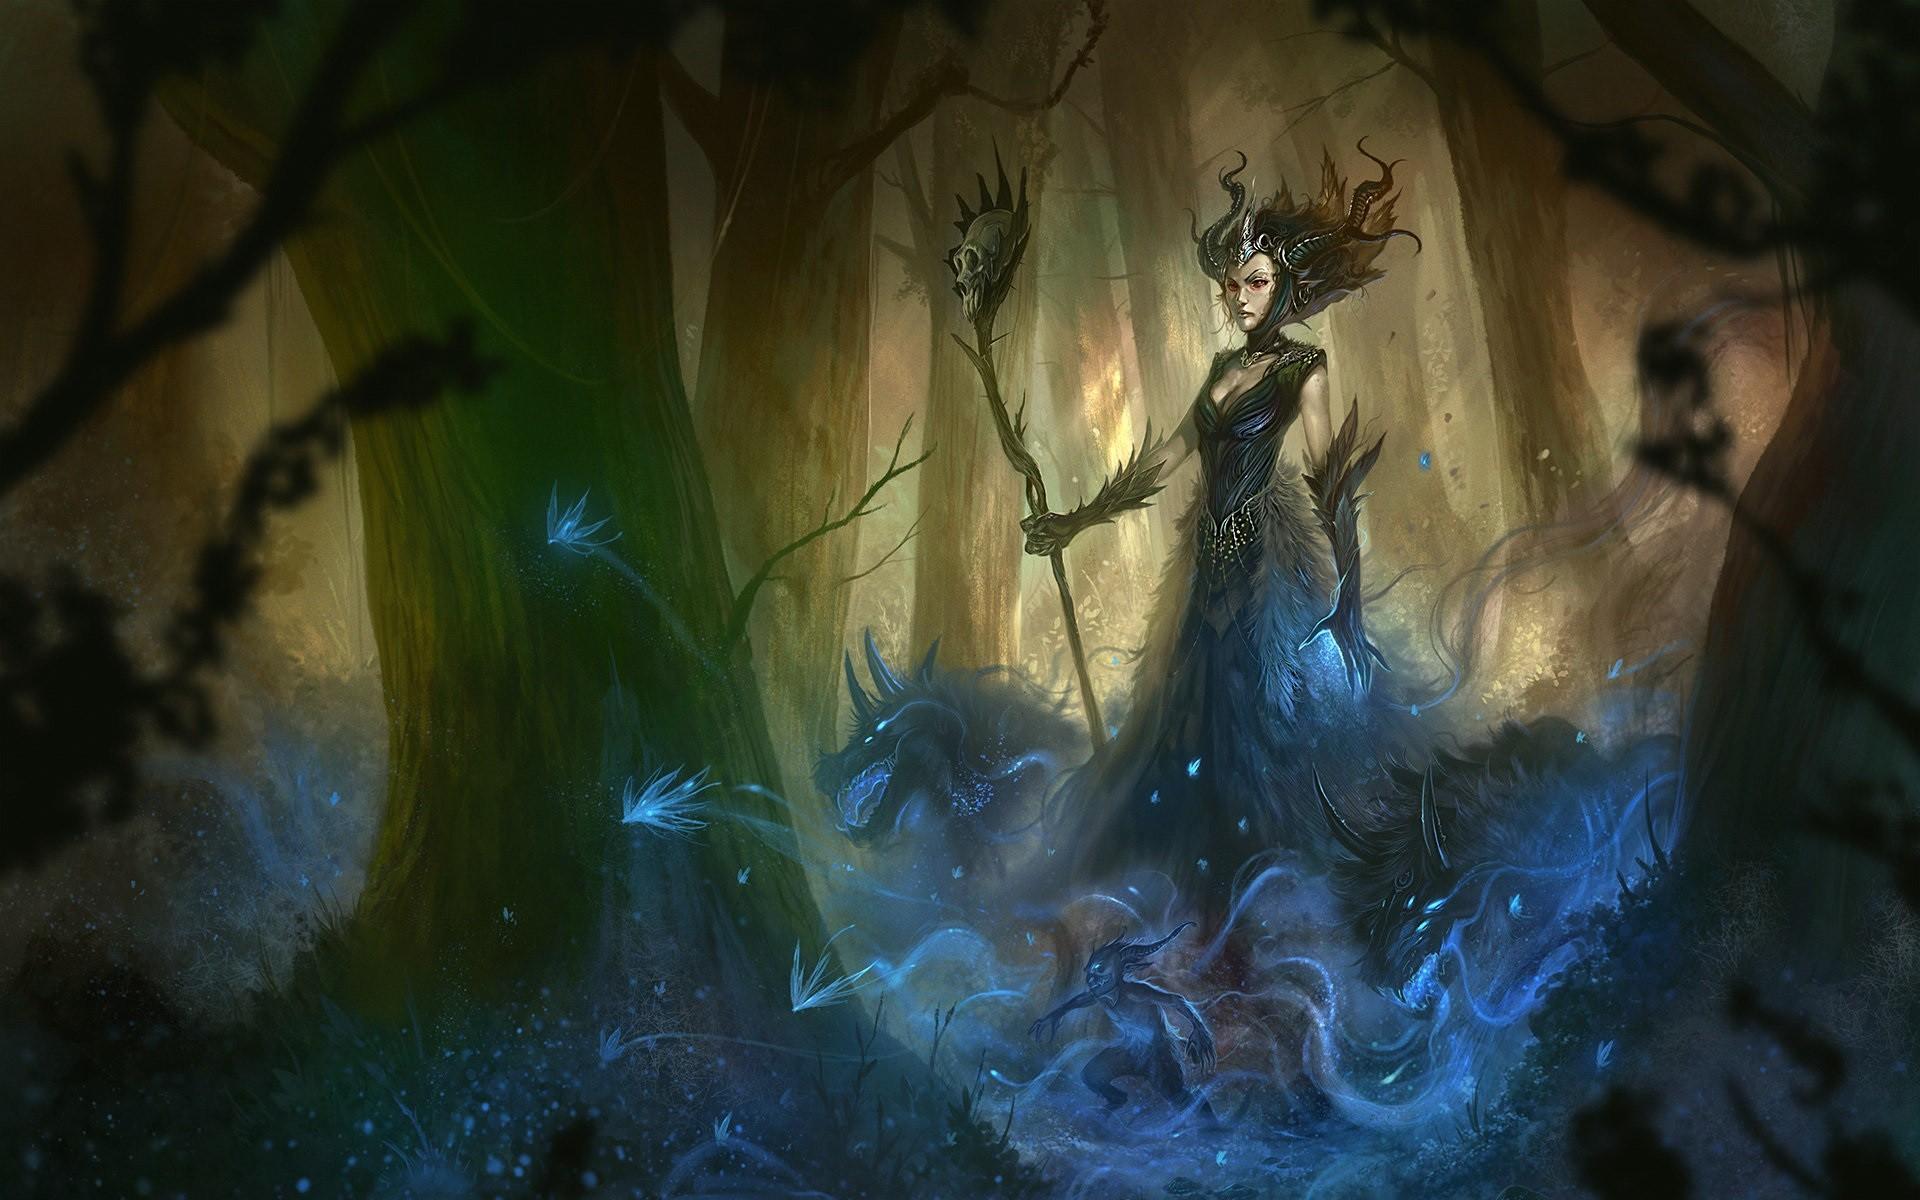 Wallpaper : fantasy art, artwork, witch, mythology